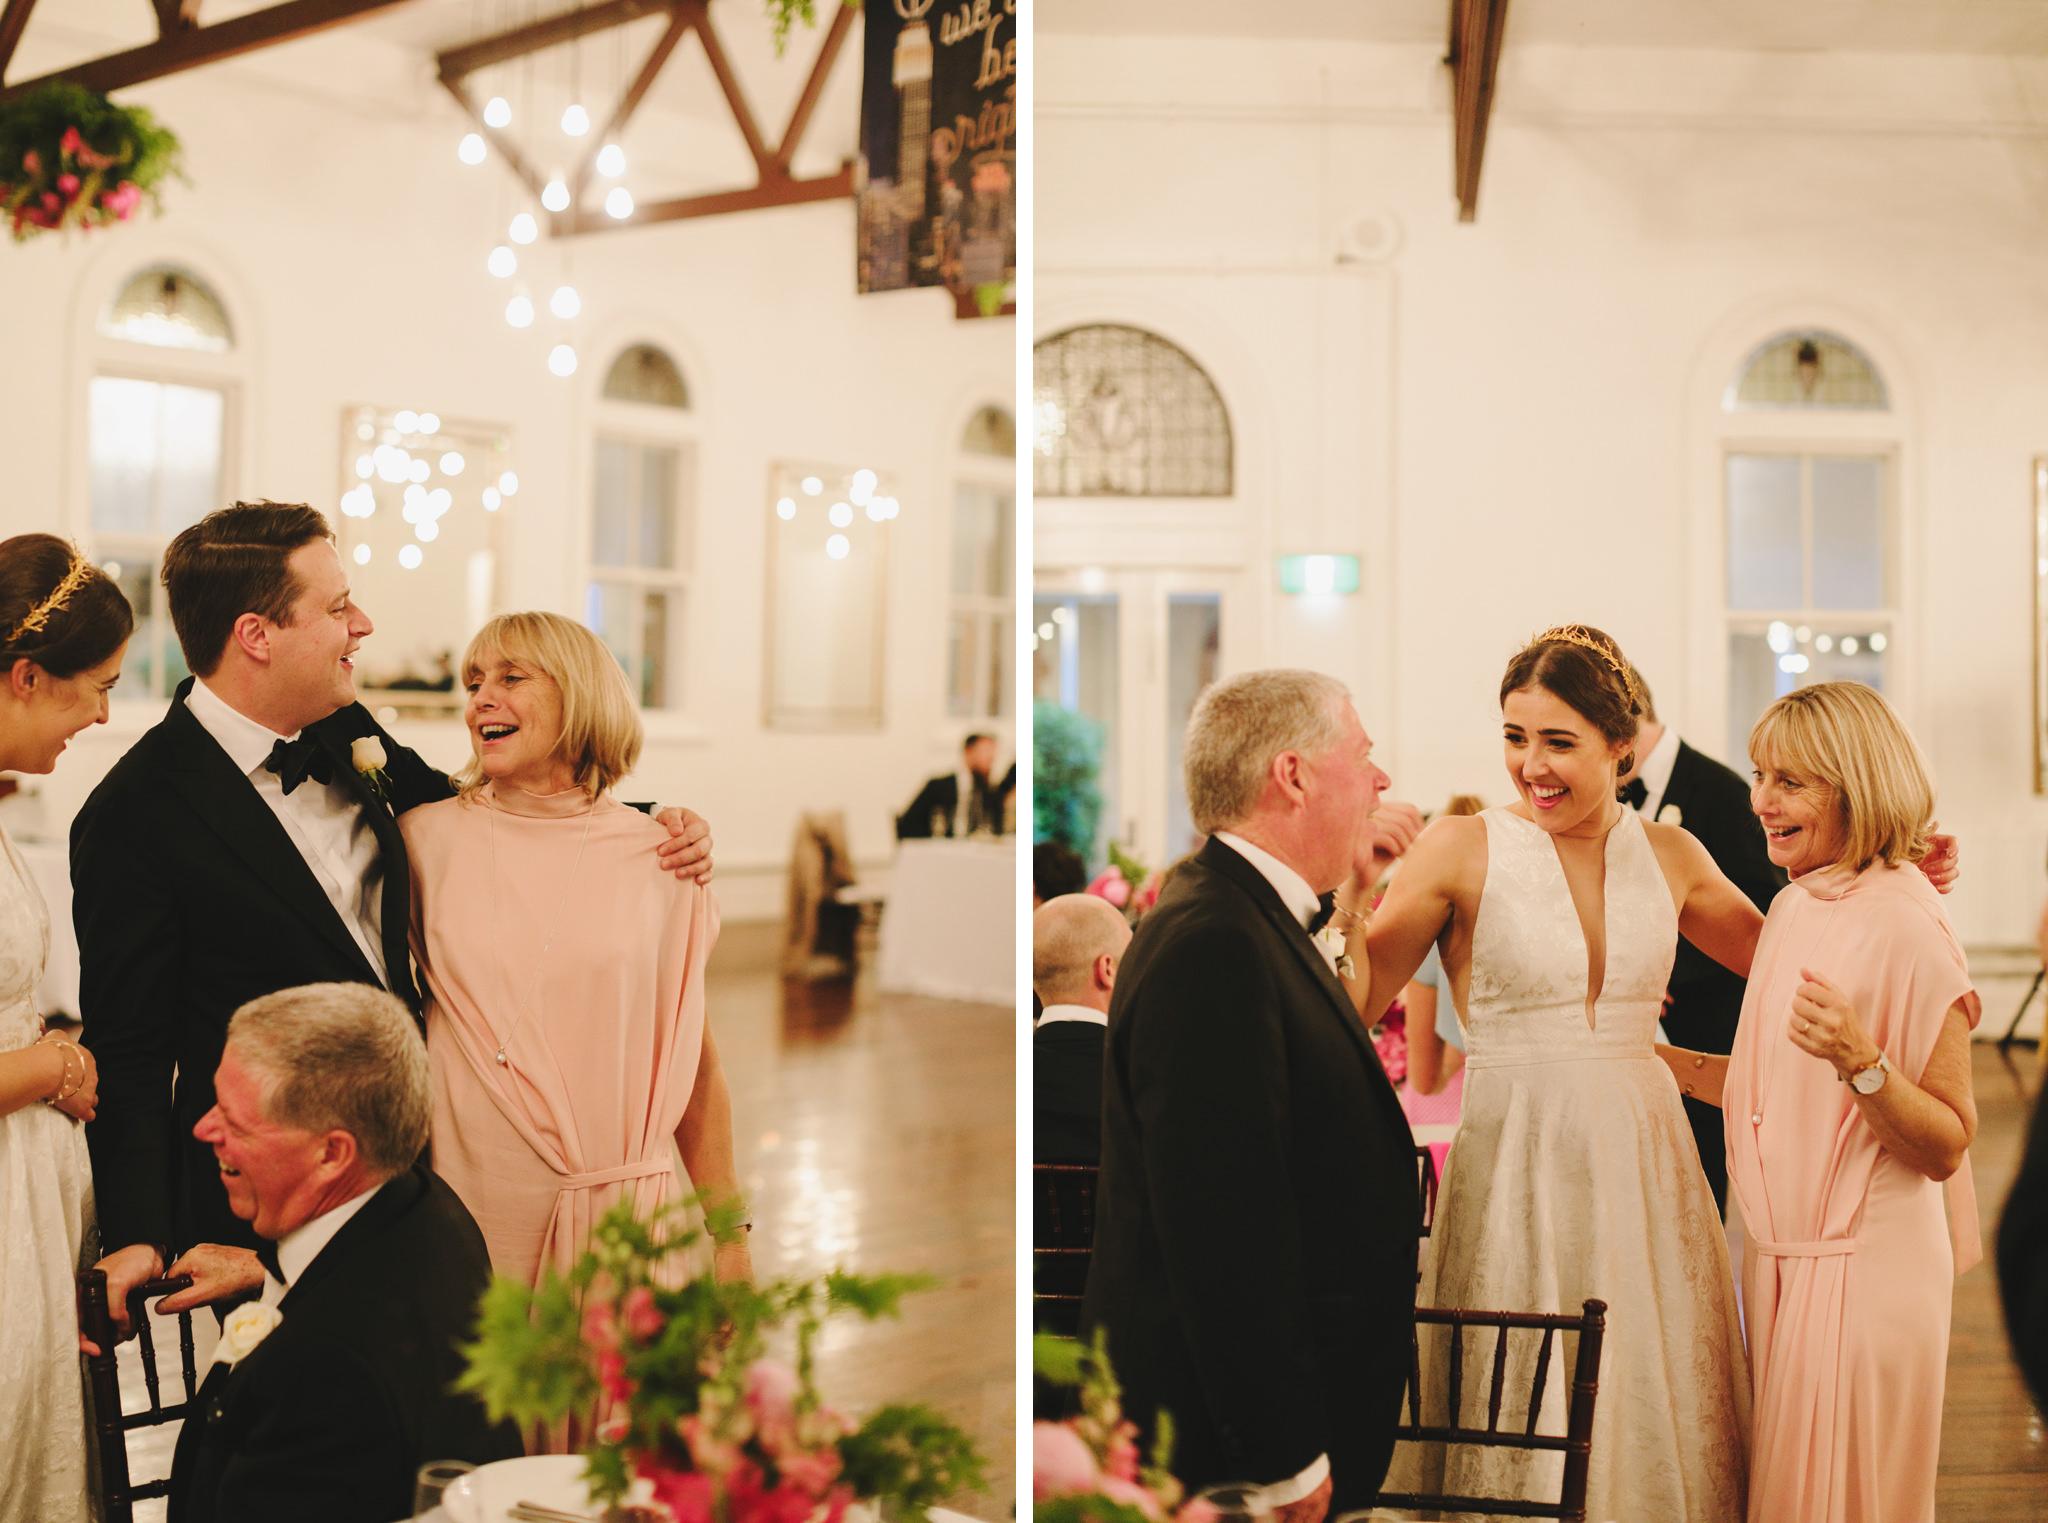 Abbotsford_Convent_Wedding_Peter_Anna114.JPG